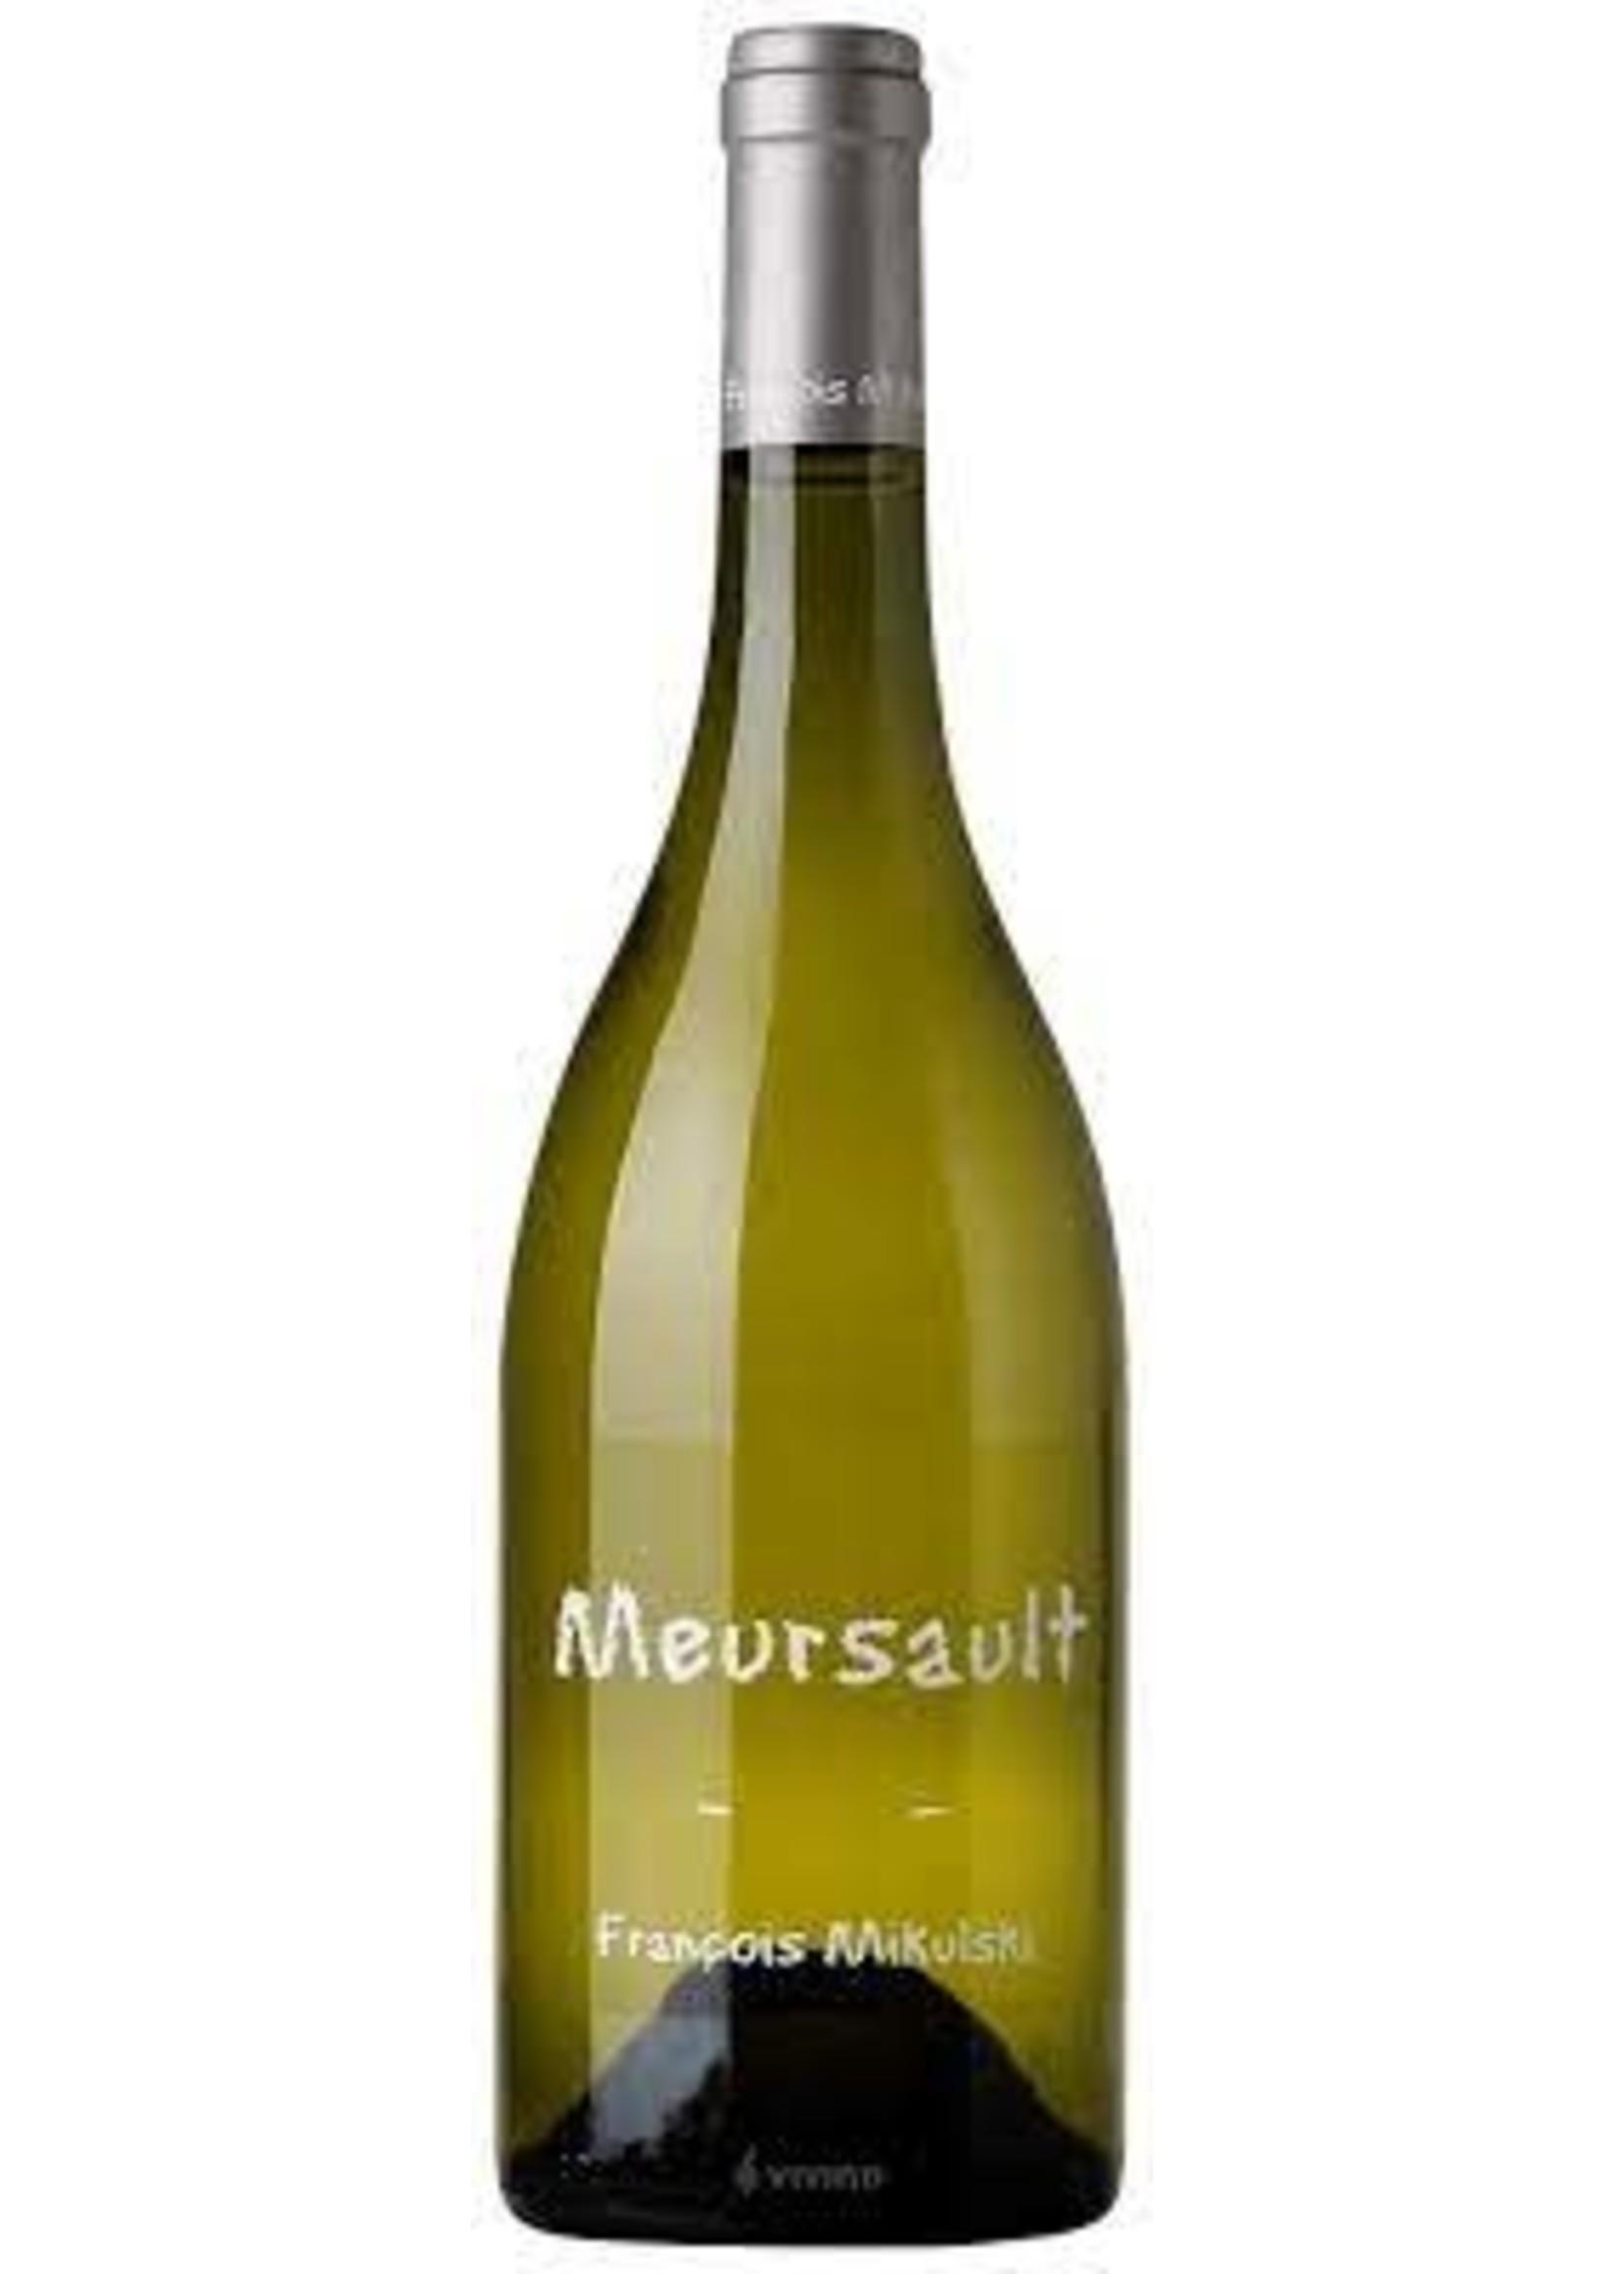 Francois Mikulski 2019 Meursault 750ml